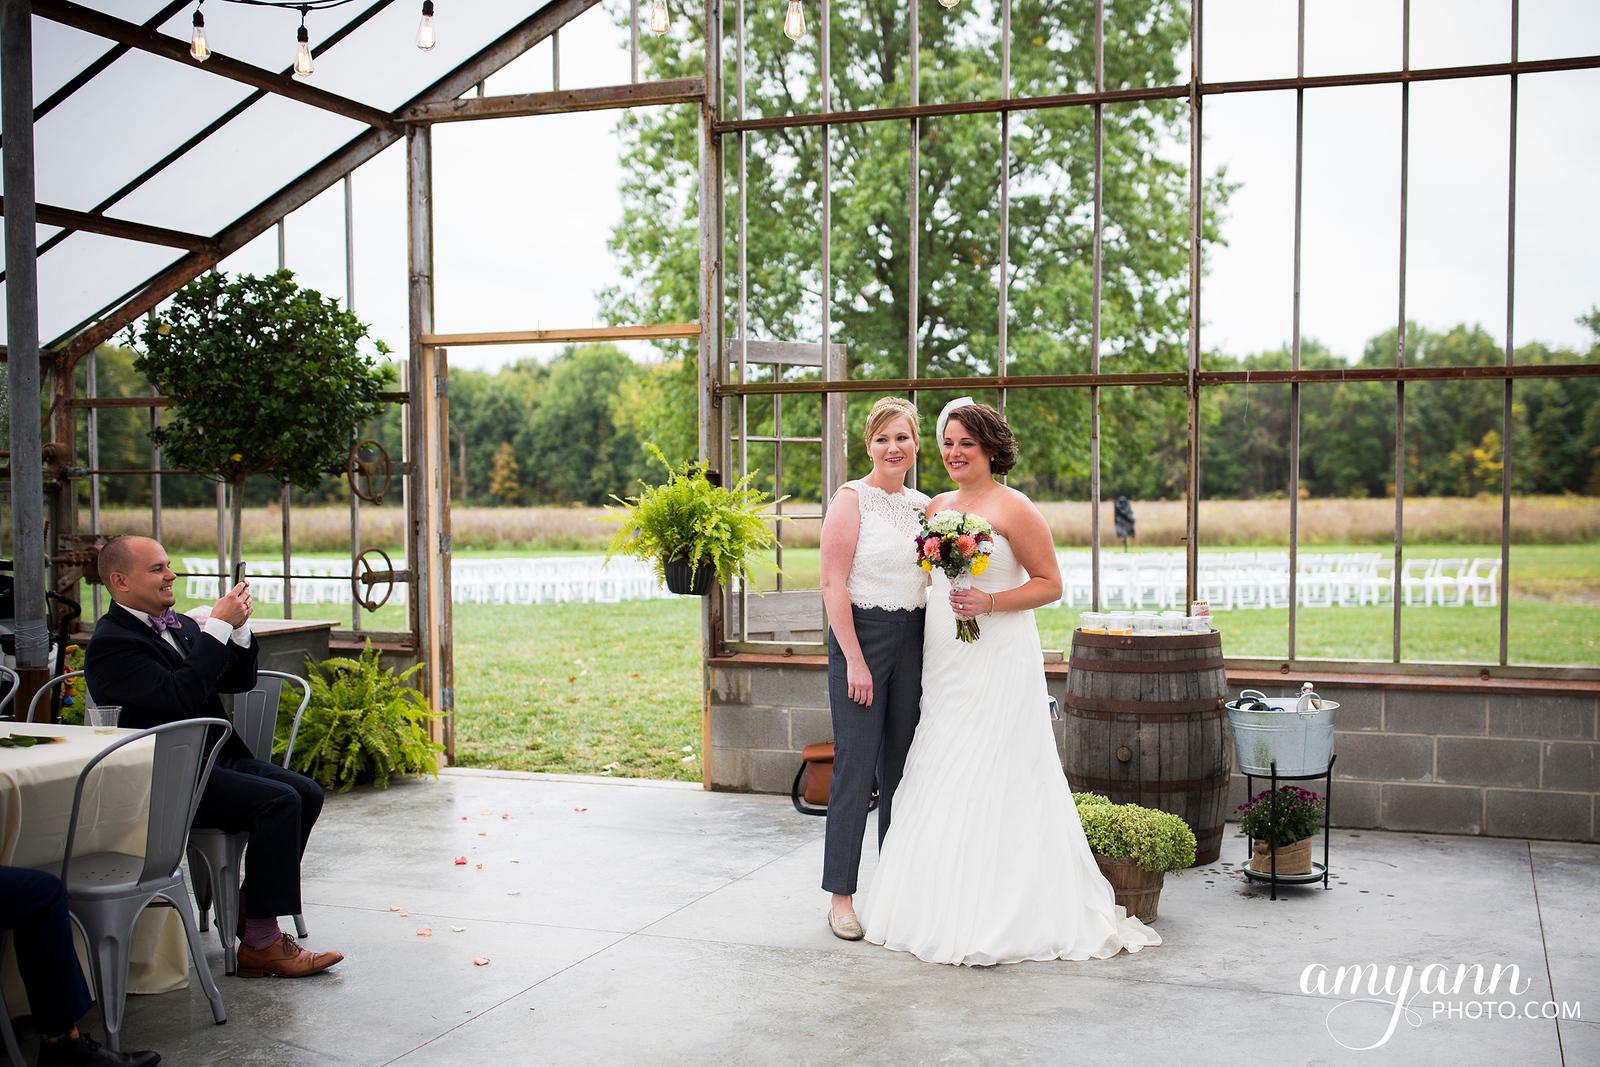 lindyangie_weddingblog47